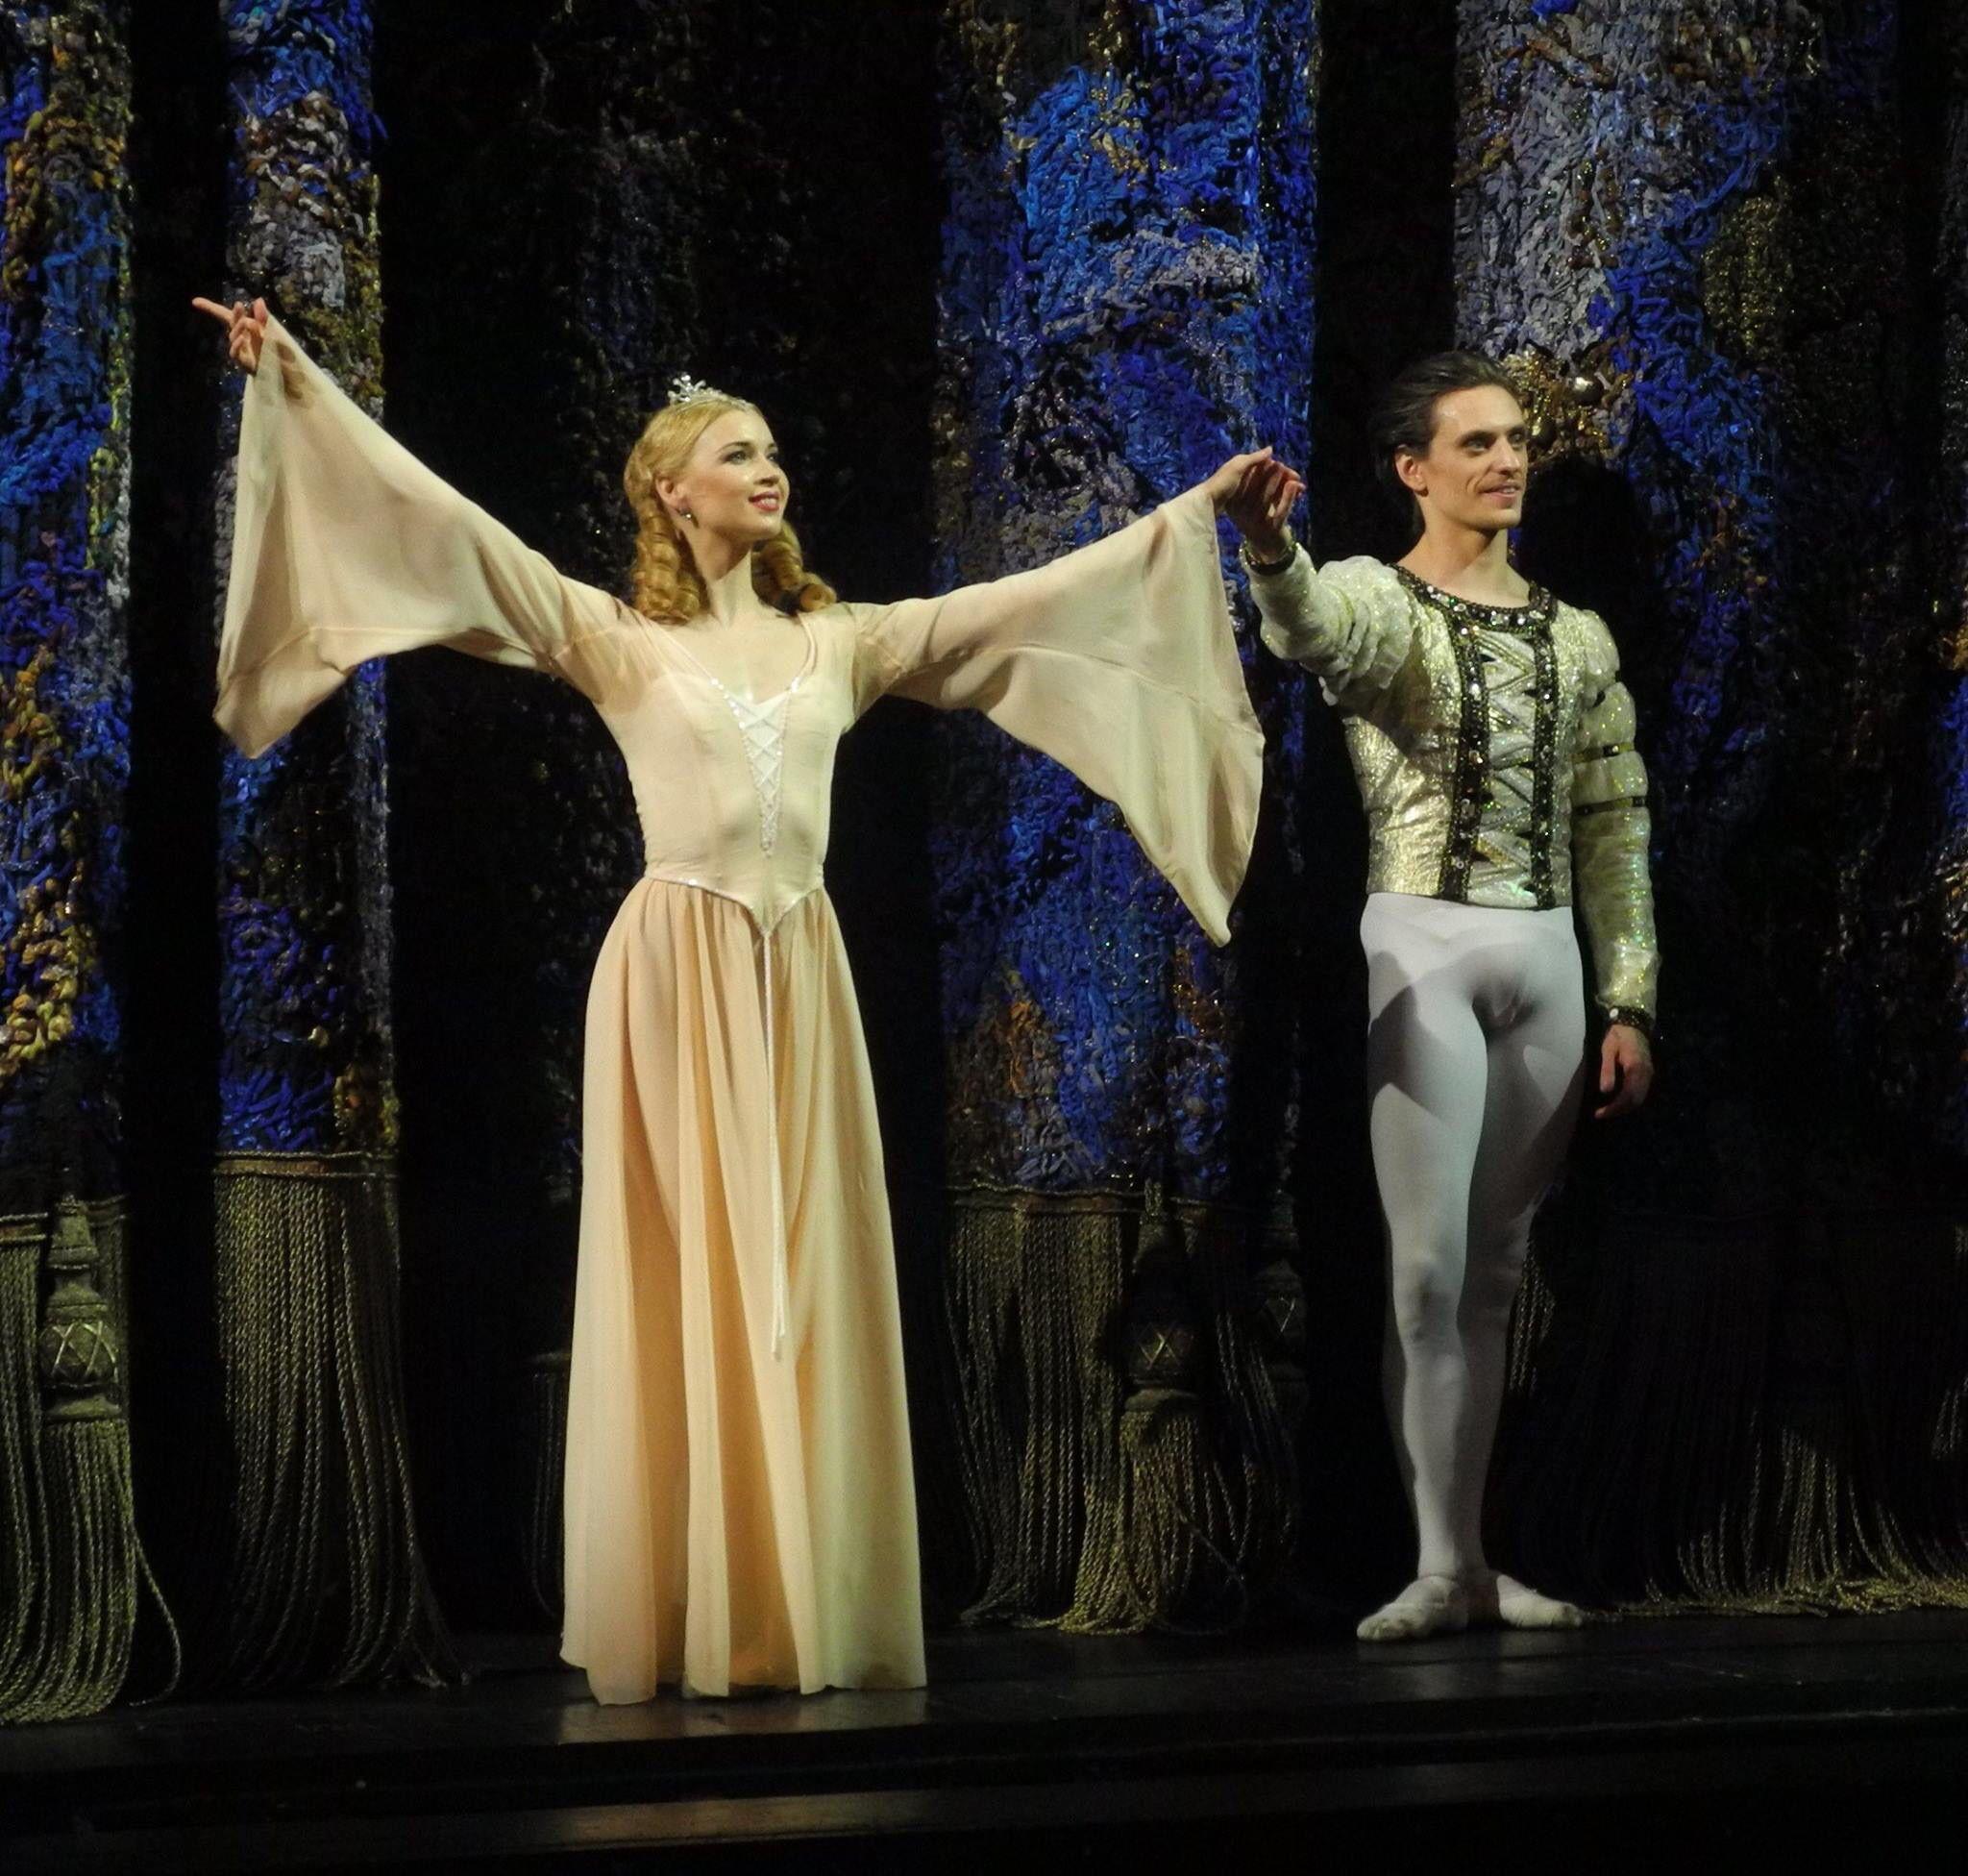 Sergei Polunin And Natalia Somova Swan Lake Curtain Call 21 04